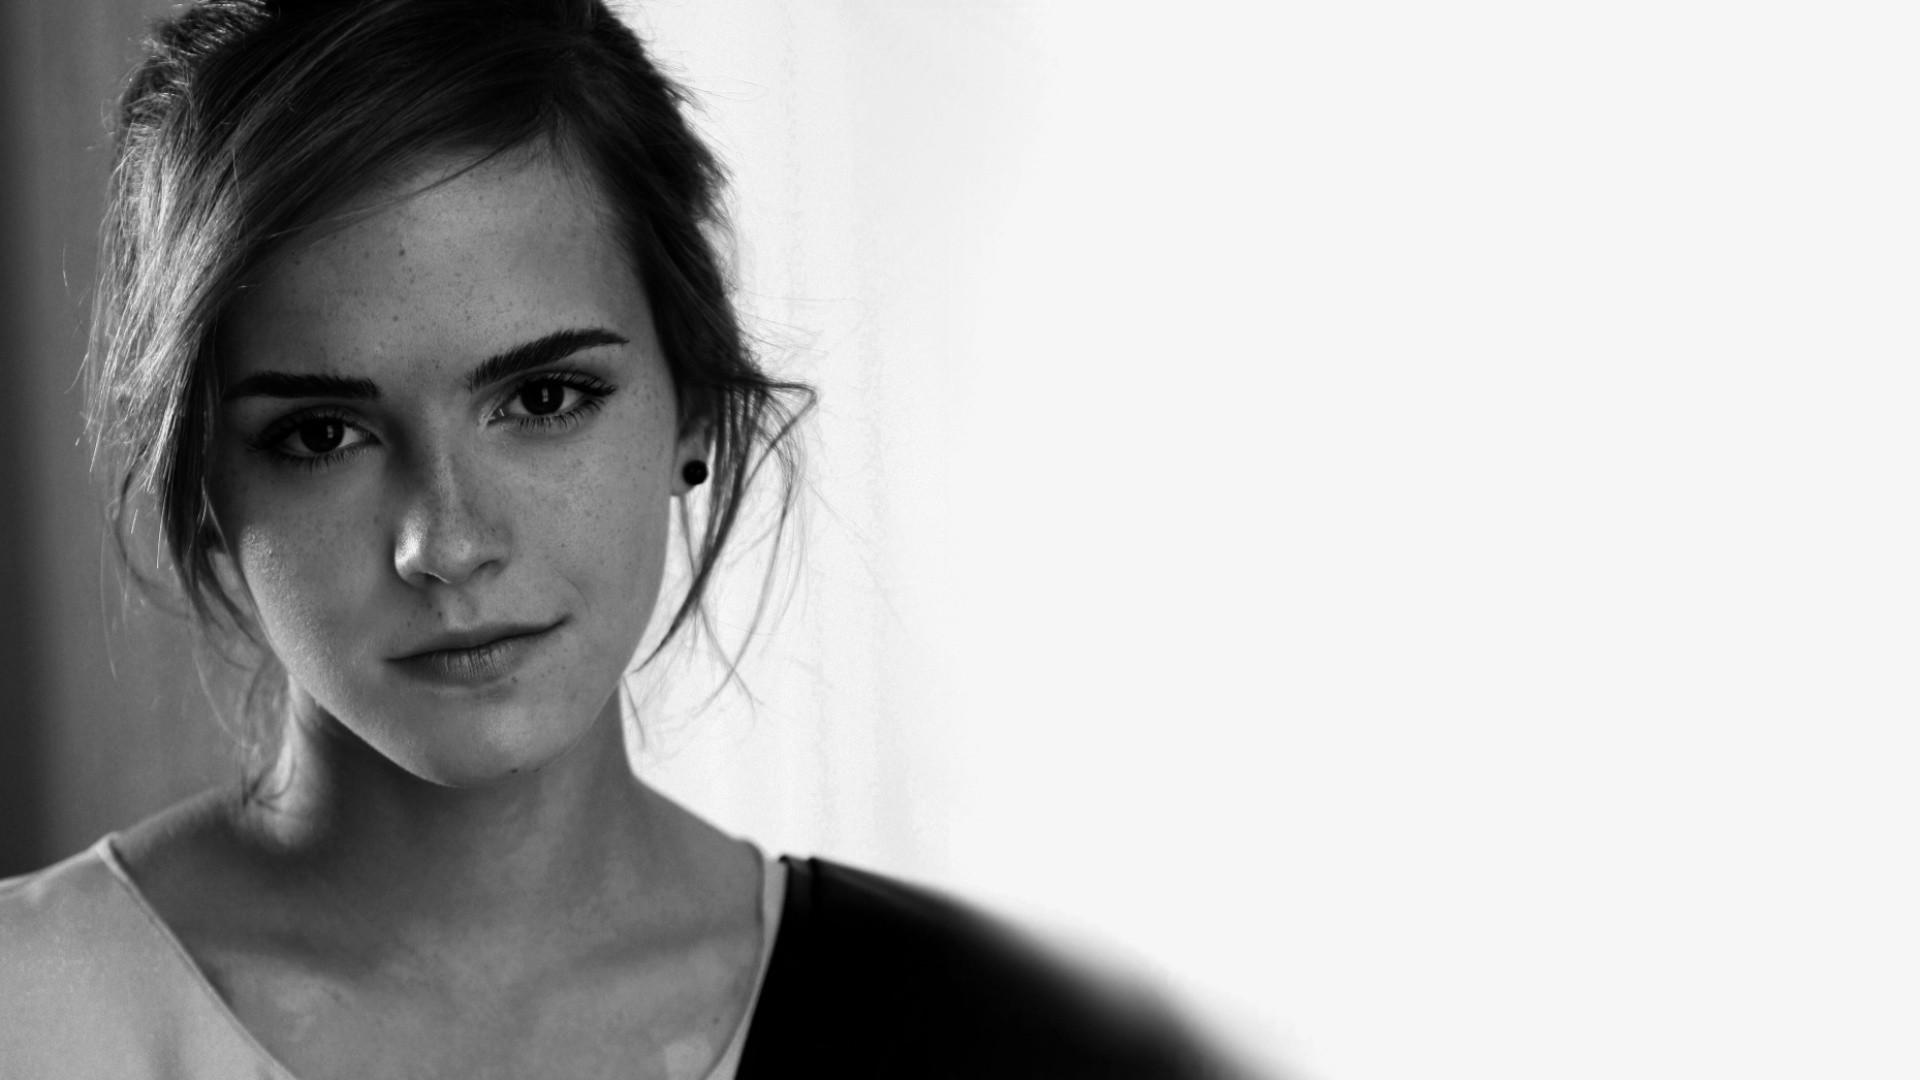 Emma Watson Iphone Wallpaper #25659 Hd Wallpapers Background .